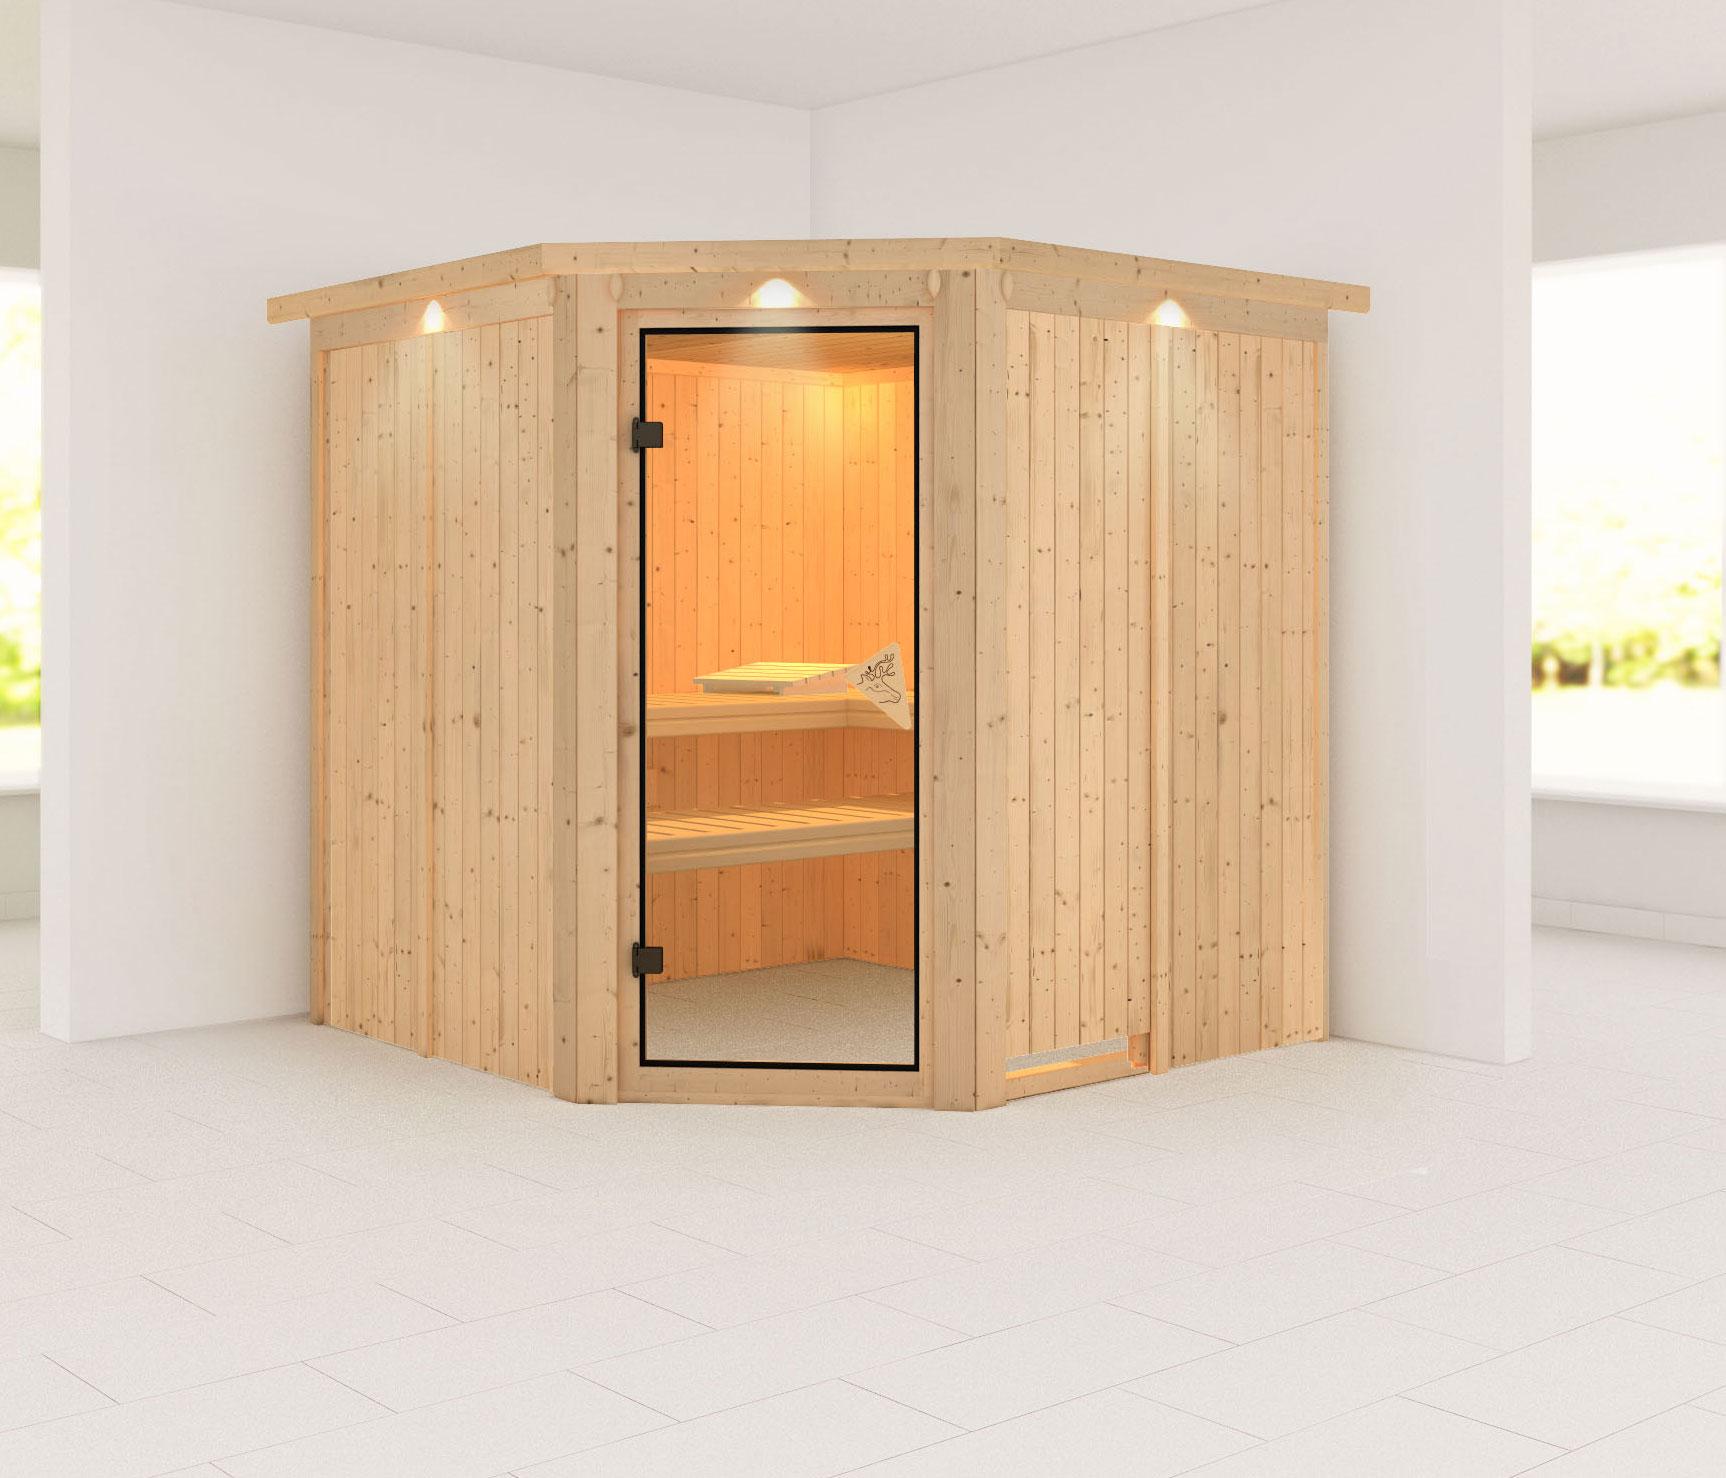 Karibu Sauna Jarin 68mm Dachkranz ohne Ofen classic Tür Bild 1